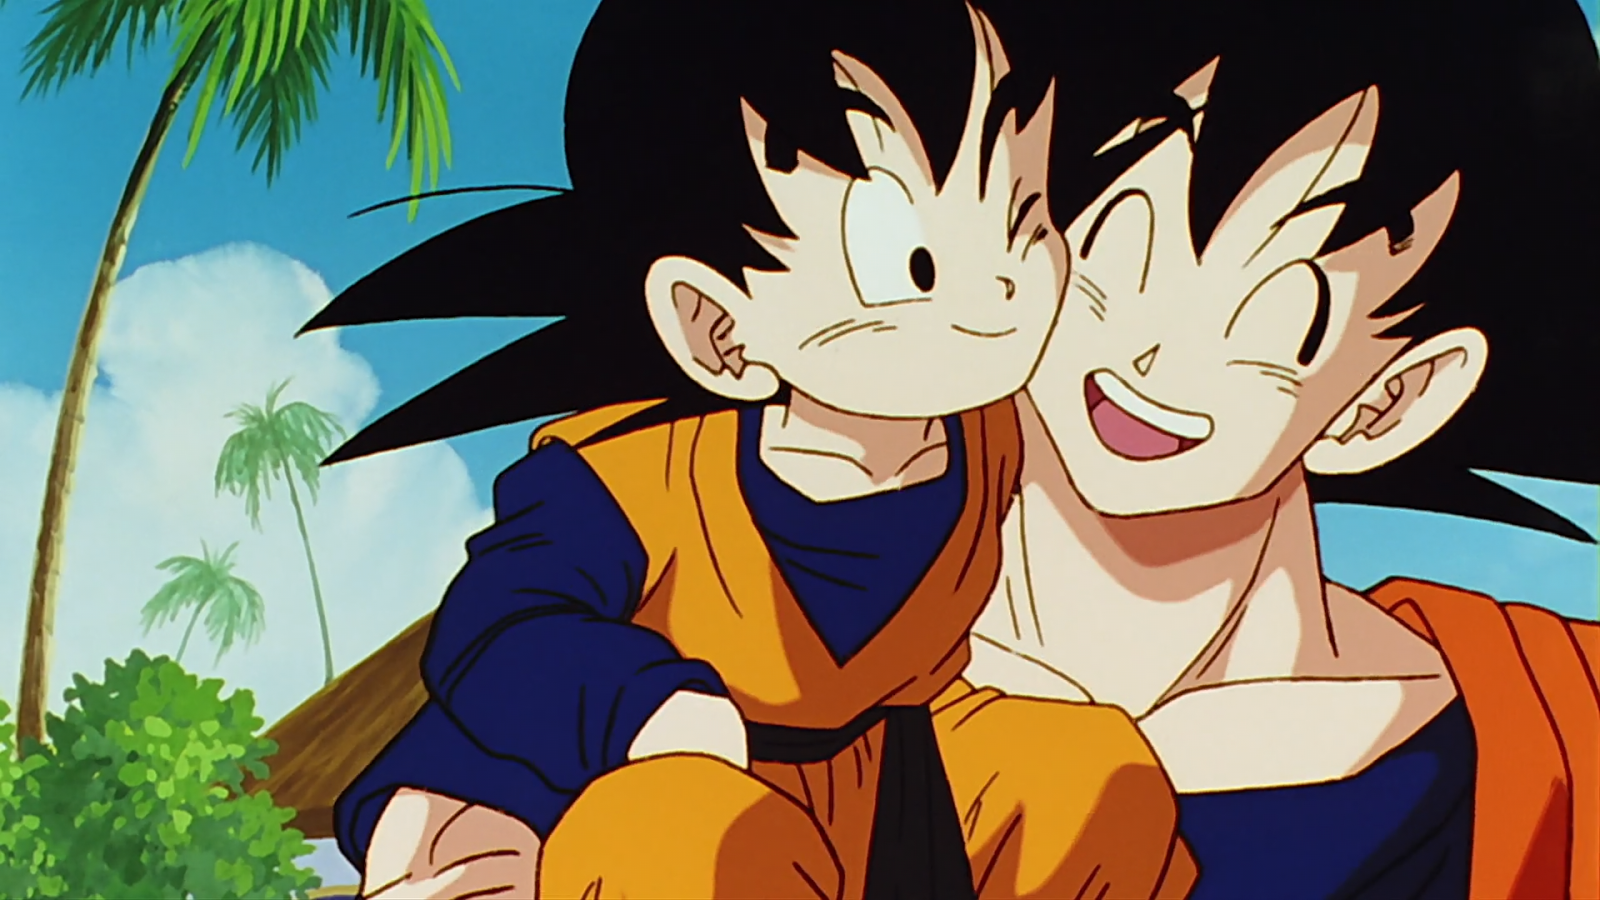 Vegeta Trunks And Goku Goten